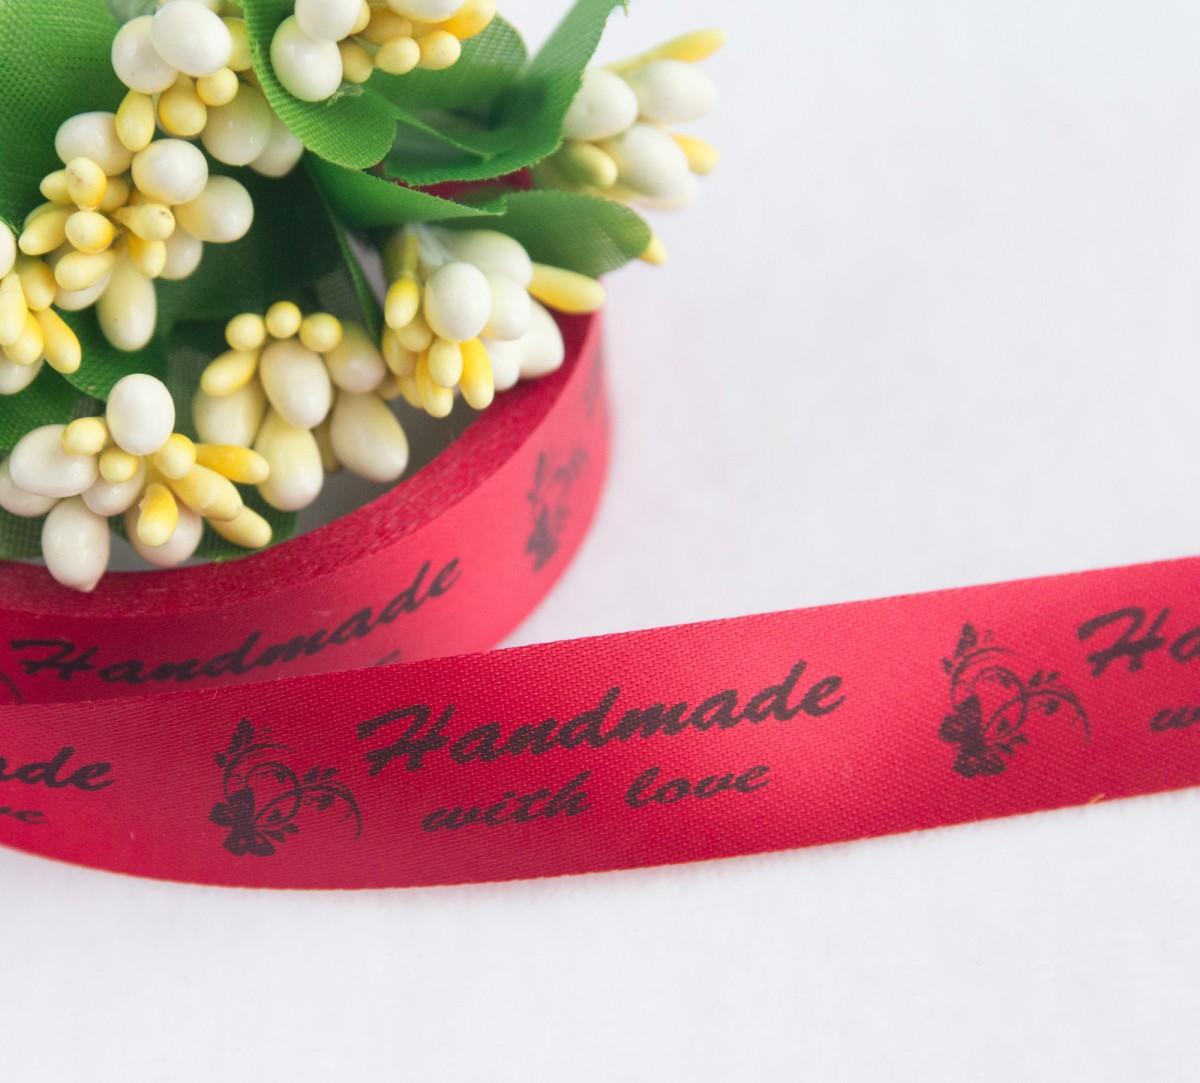 ТОЛЬКО У НАС! Лента сатин красный Handmade 45*15мм/10шт